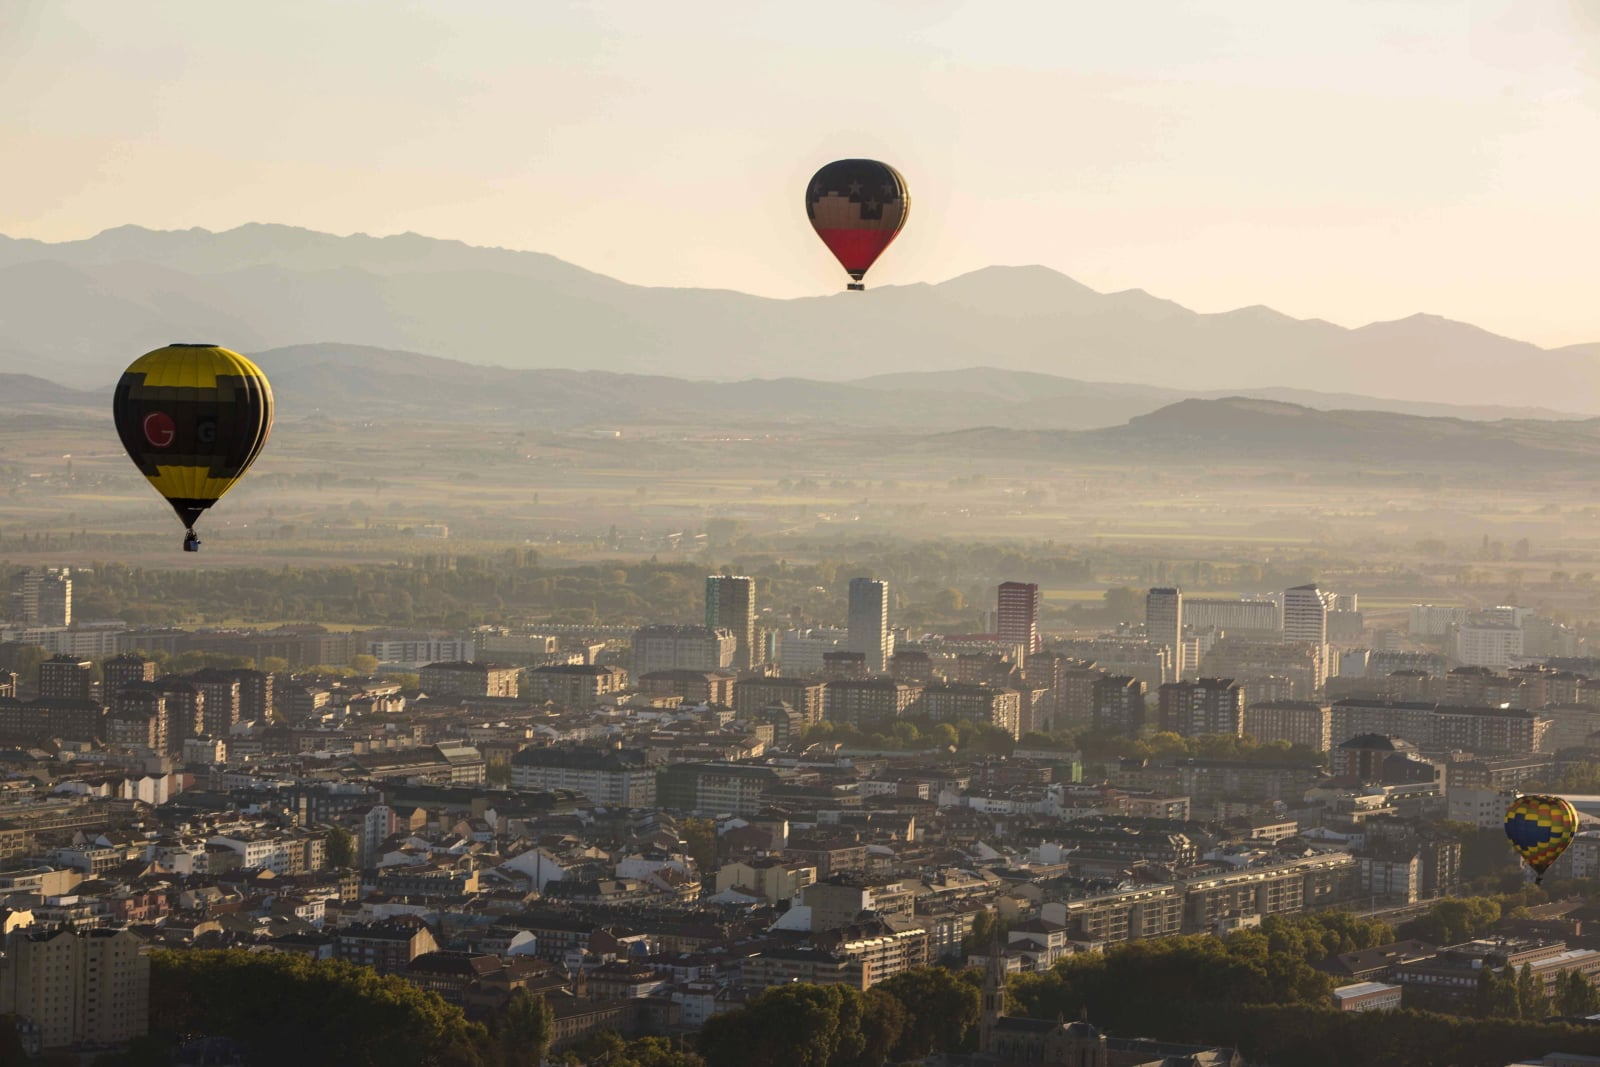 Zawody balonowe w Hiszpanii EPA/David Aguilar